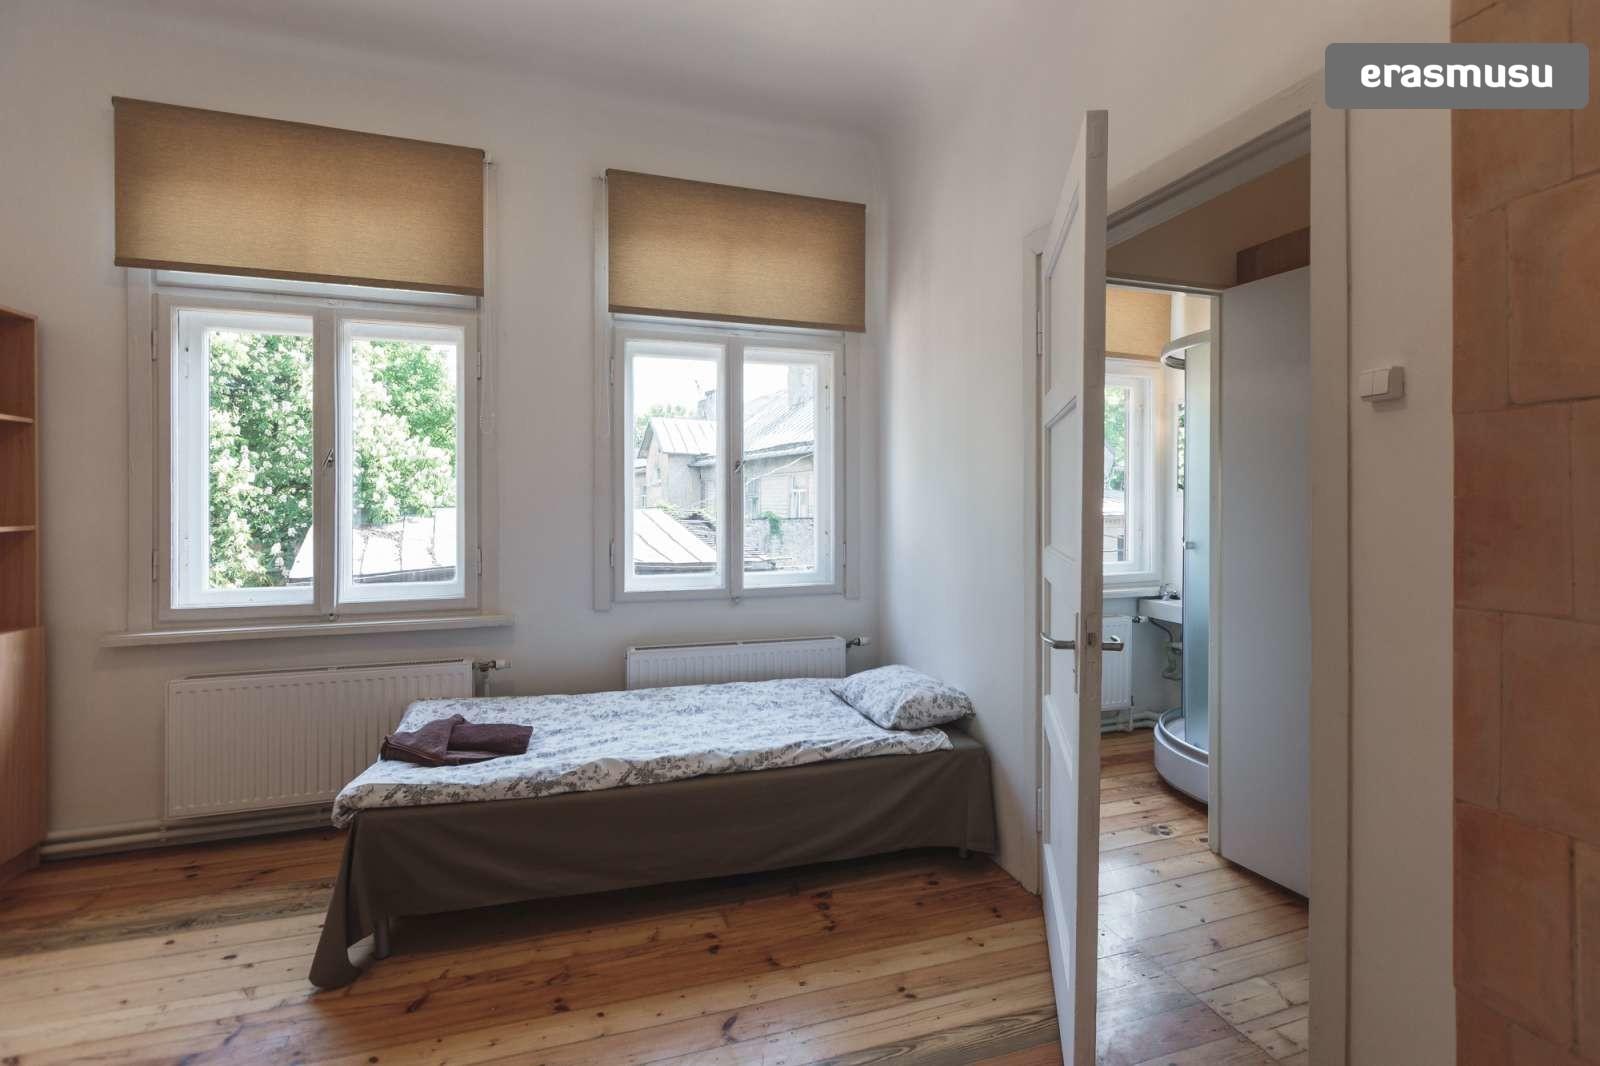 stylish-studio-apartment-rent-agenskalns-pet-friendly-5ab2df42a5